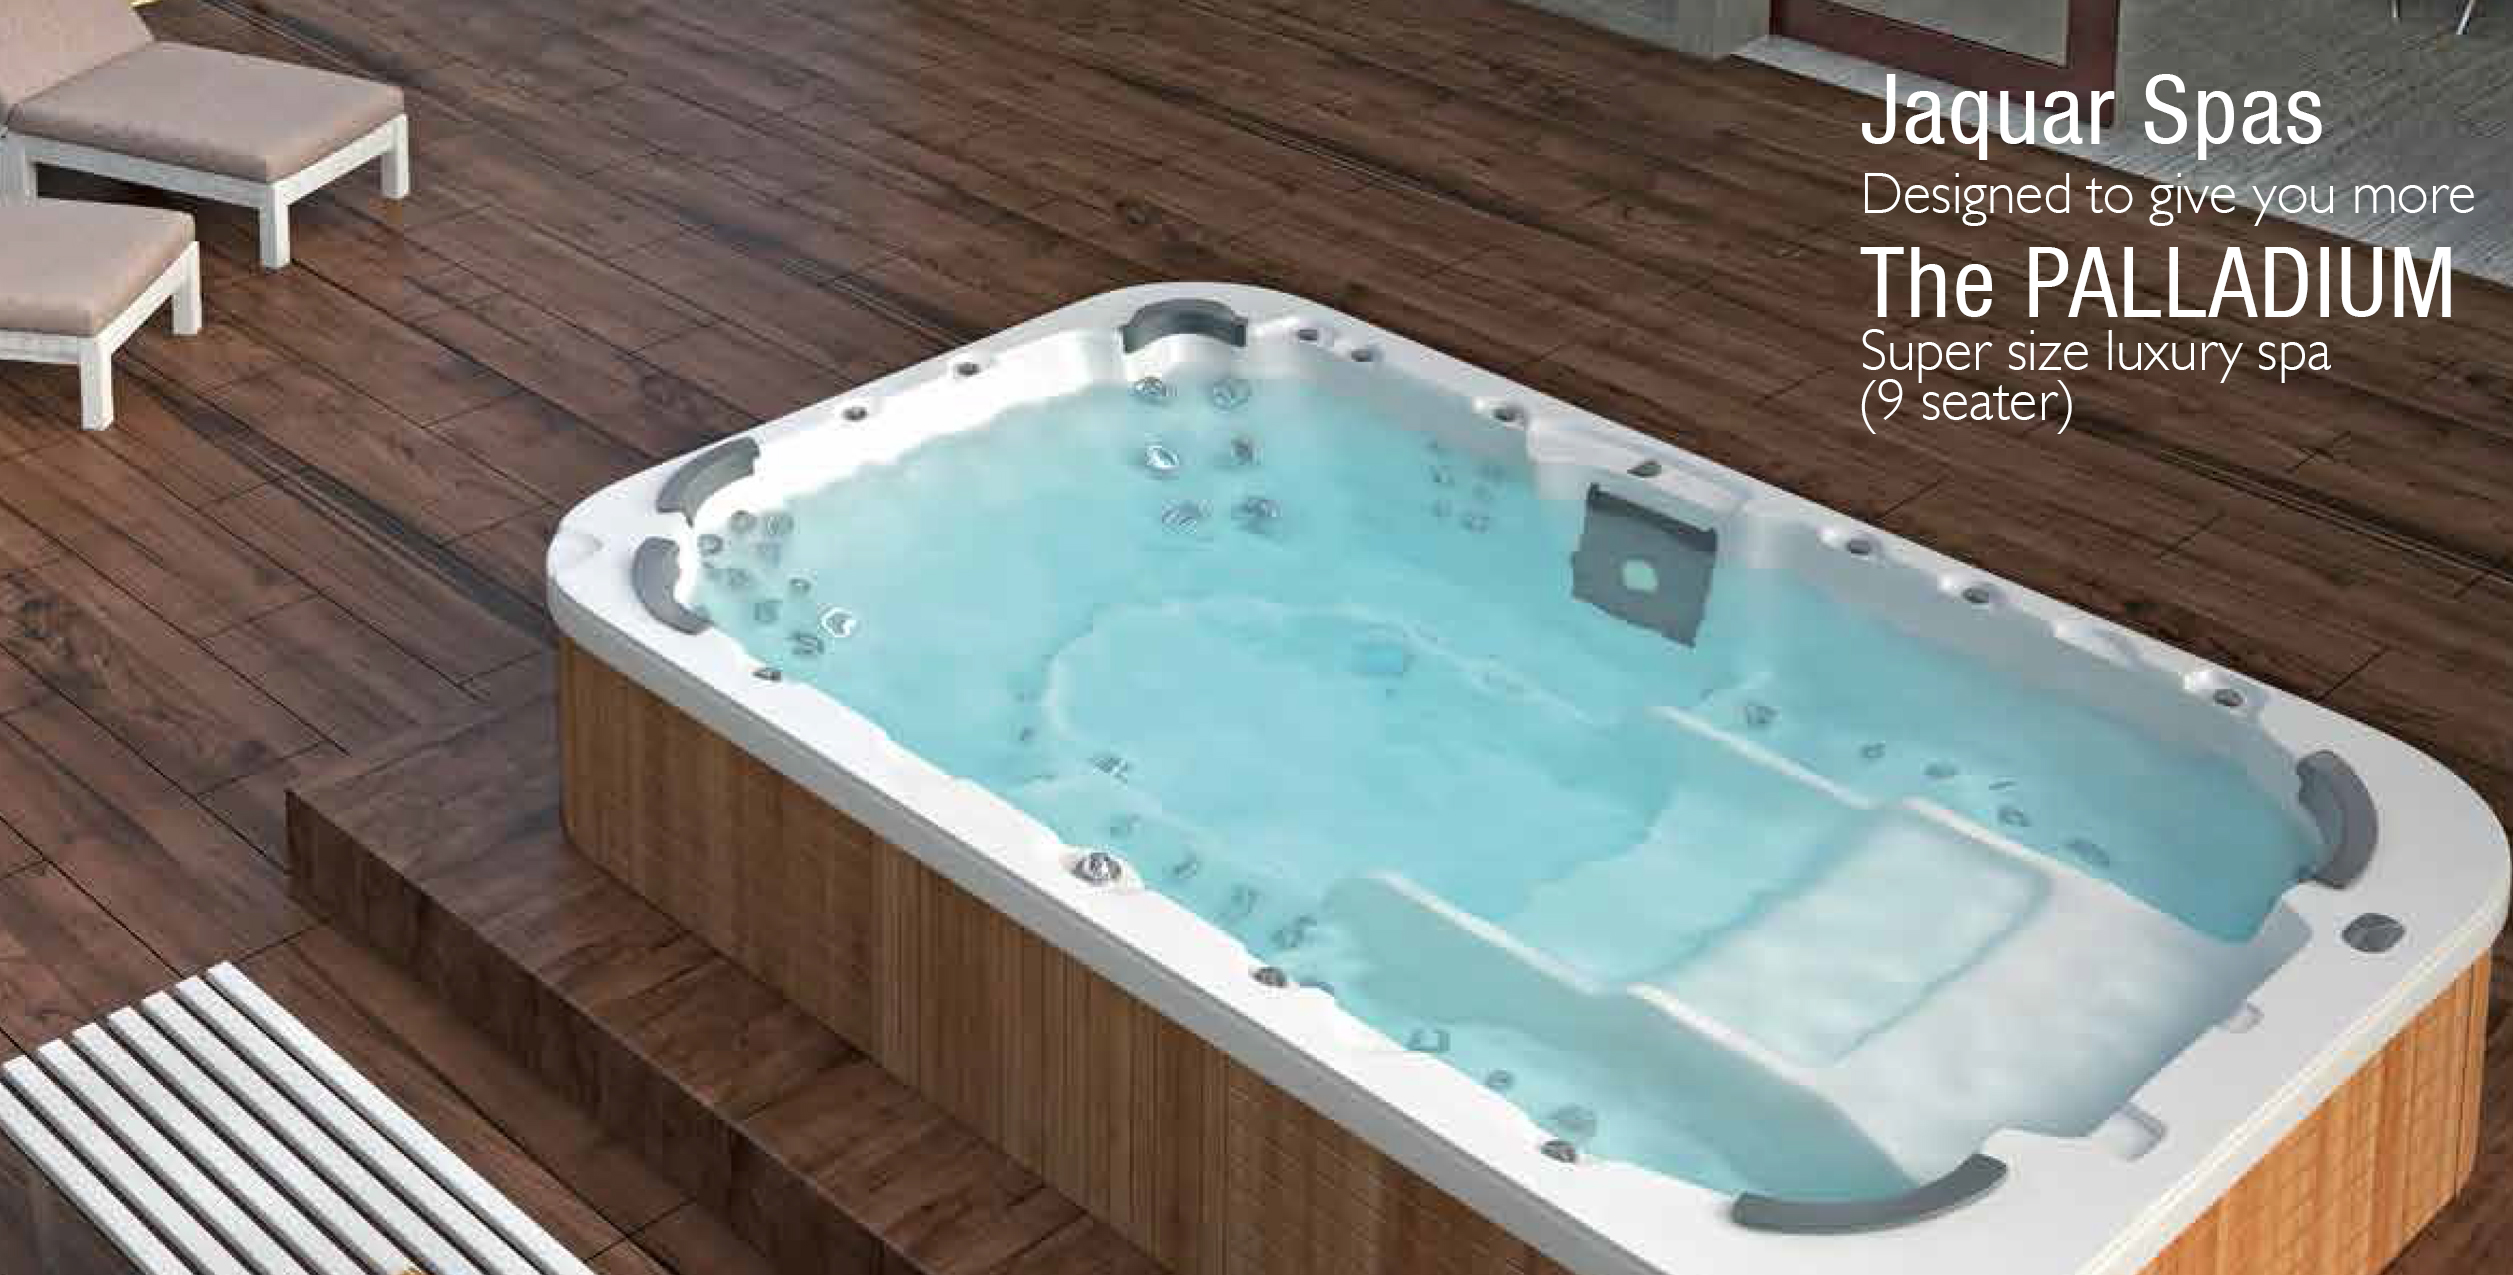 Complete Bathroom Solutions-Jaquar Spas palladium